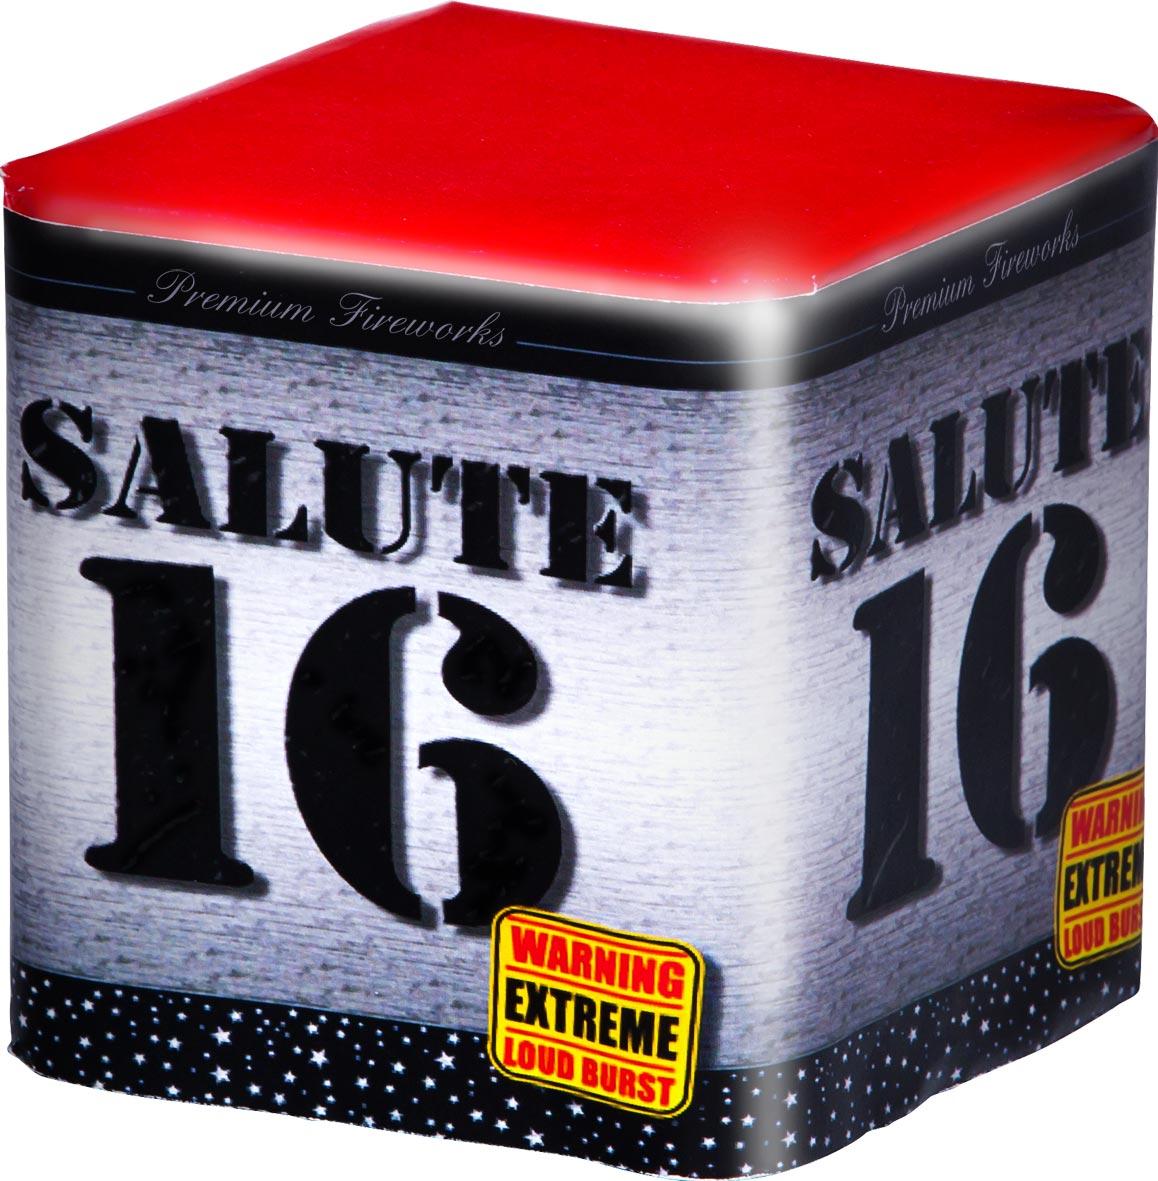 Salute 16 knalcake met 16 shots intratuin lochem for Intratuin lochem